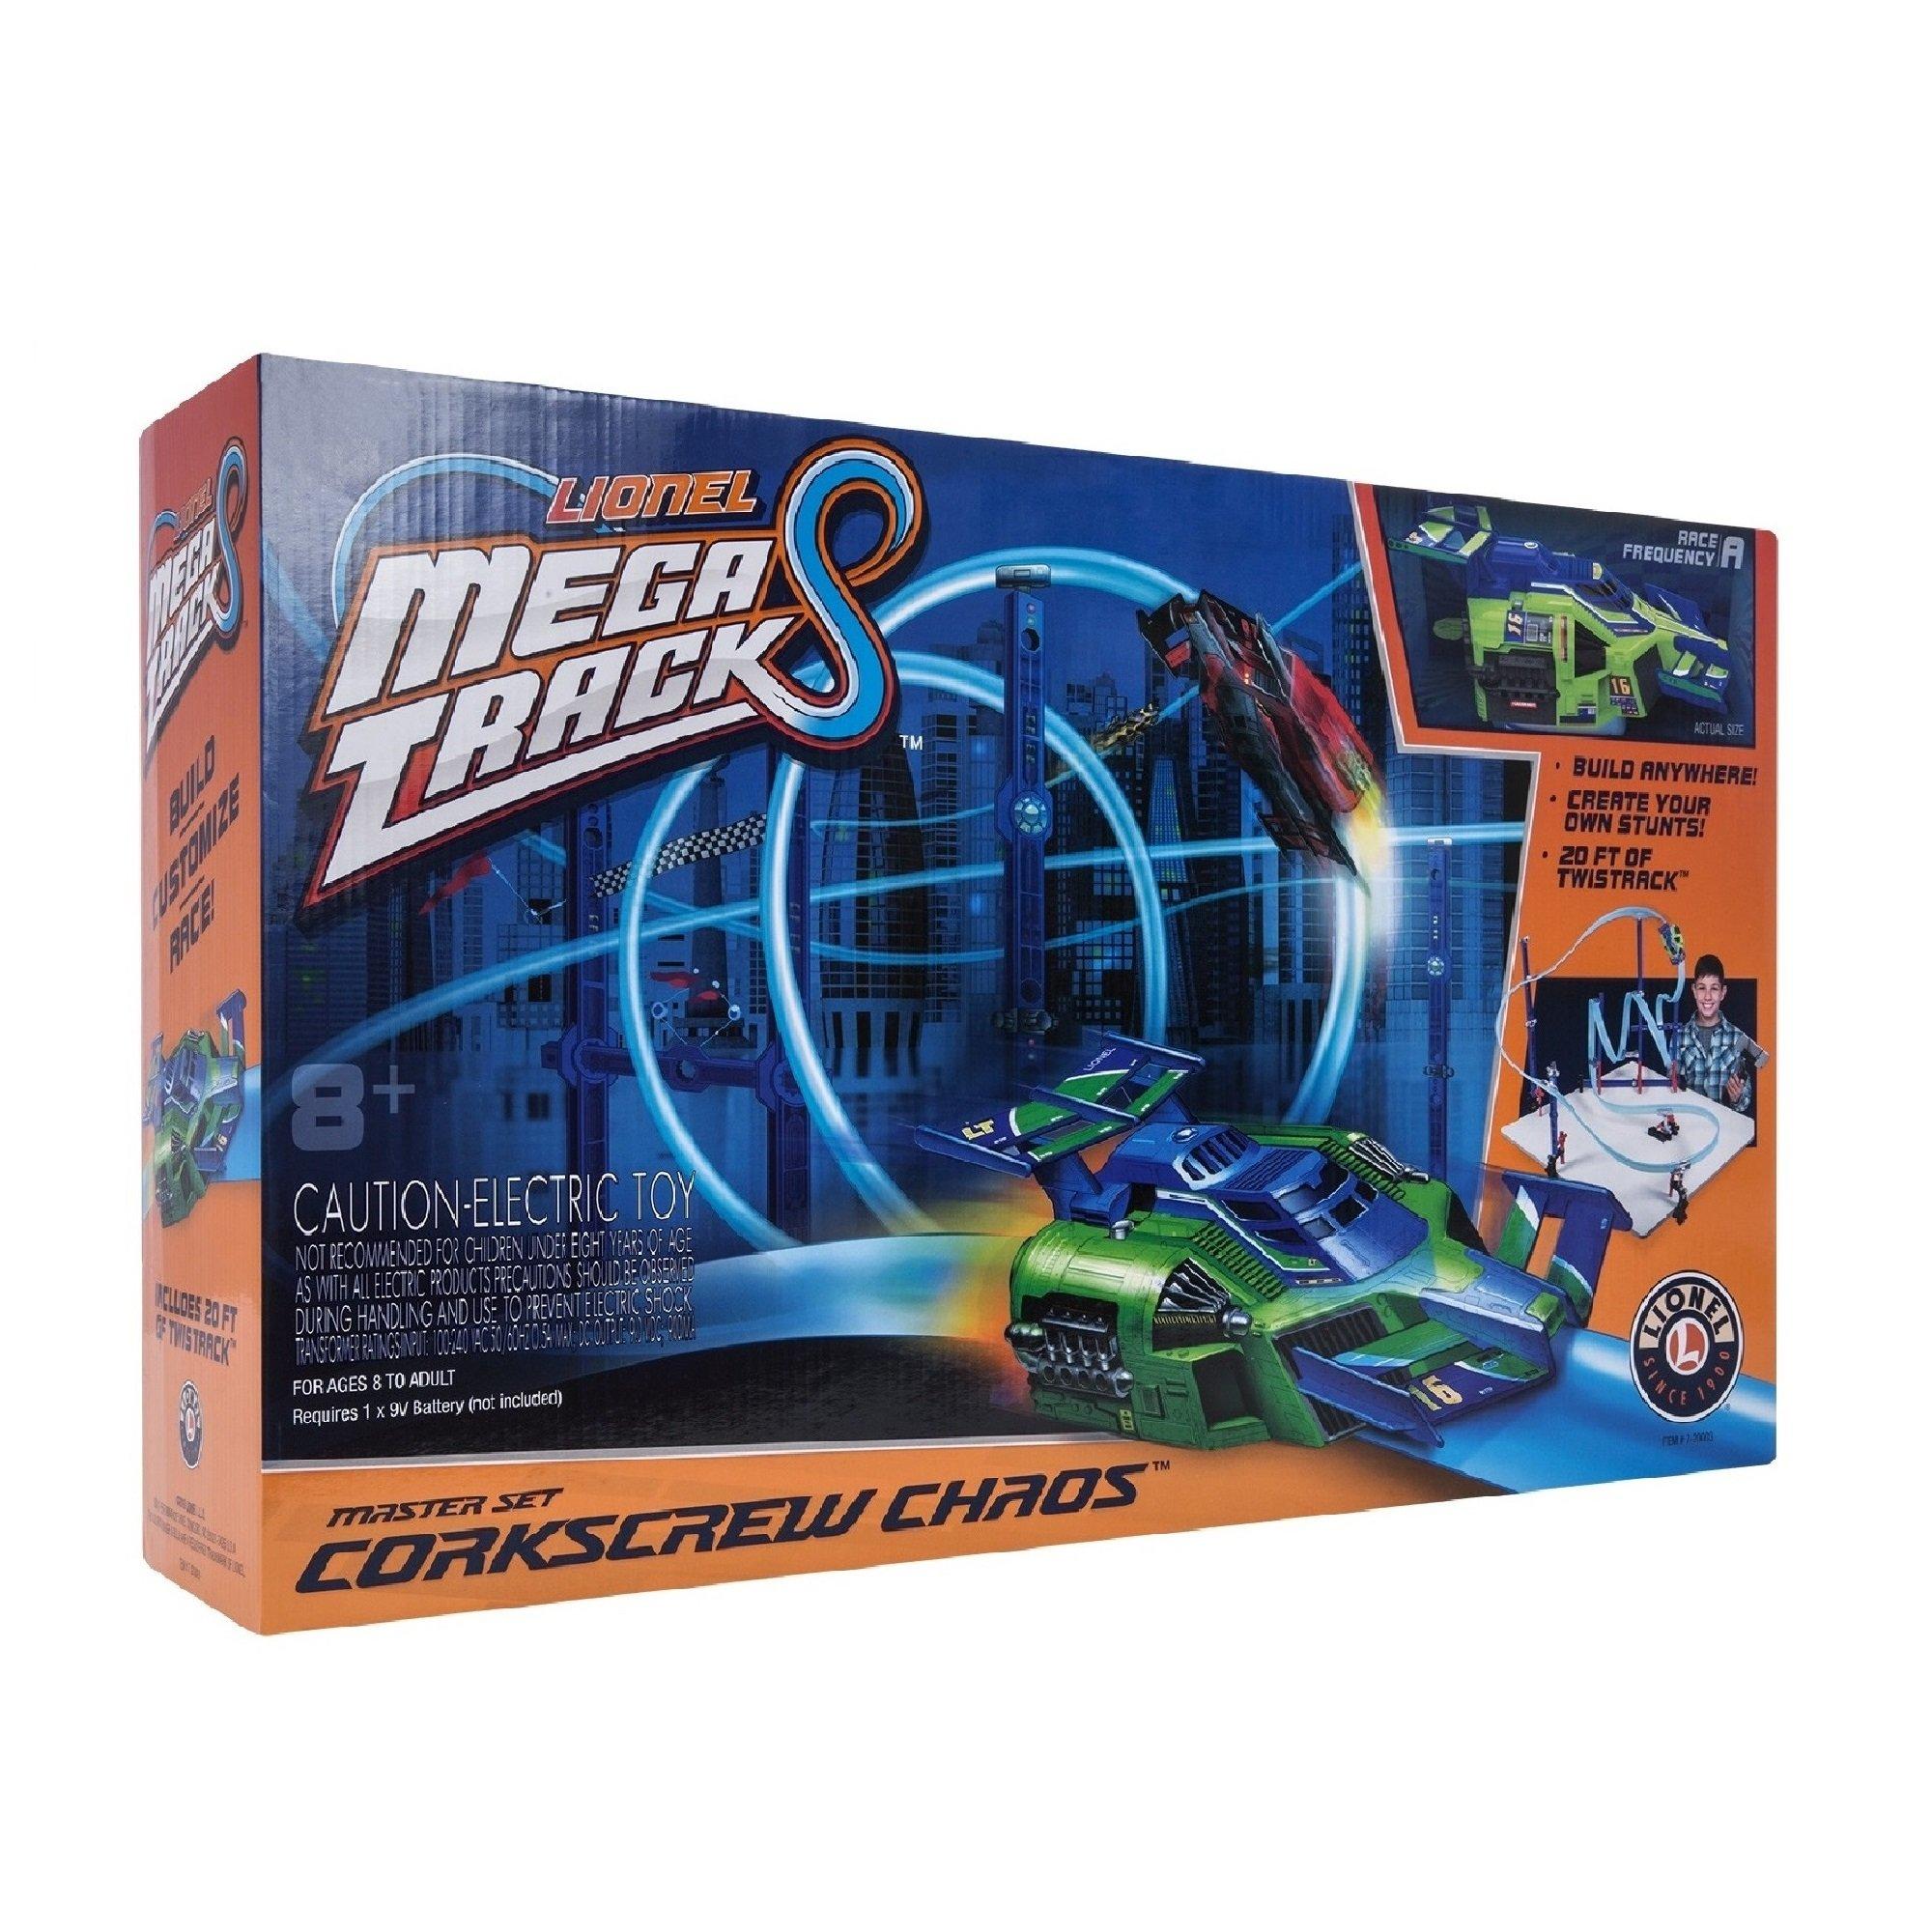 Lionel Mega Tracks - Corkscrew Chaos Green Engine by Lionel